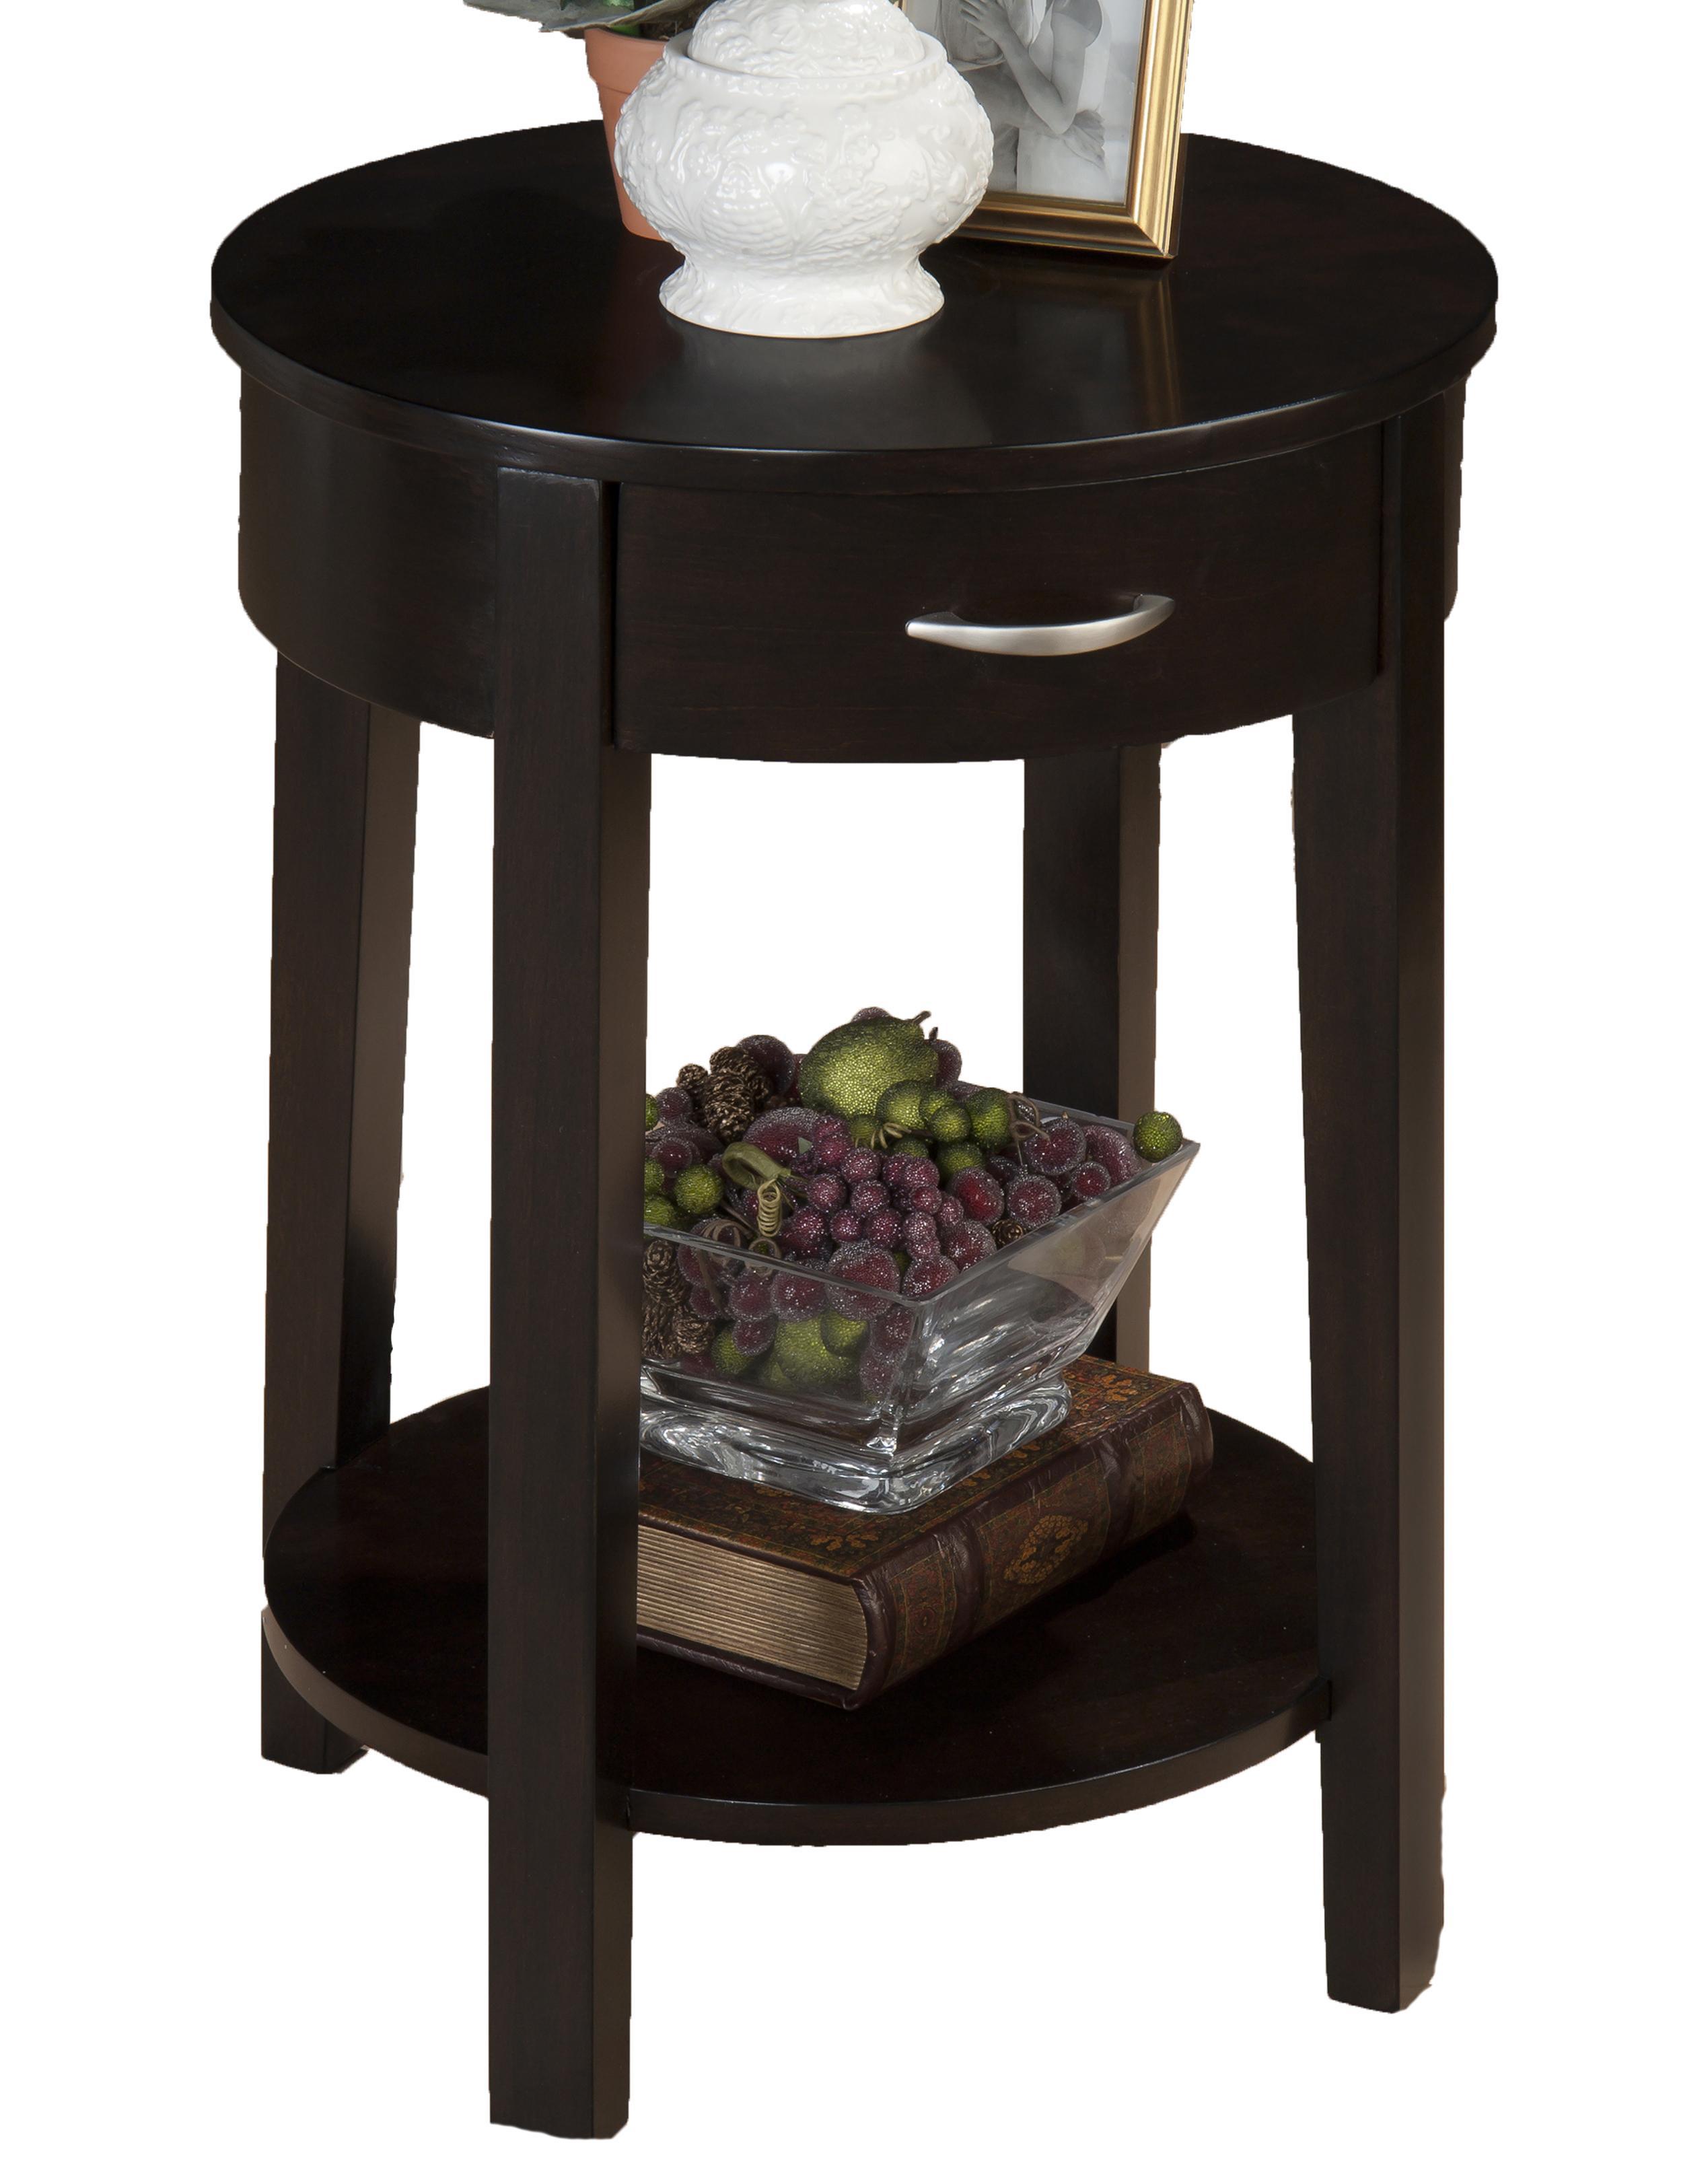 Morris Home Furnishings Dark Merlot Kilmer Chairside Table - Item Number: 1028-7